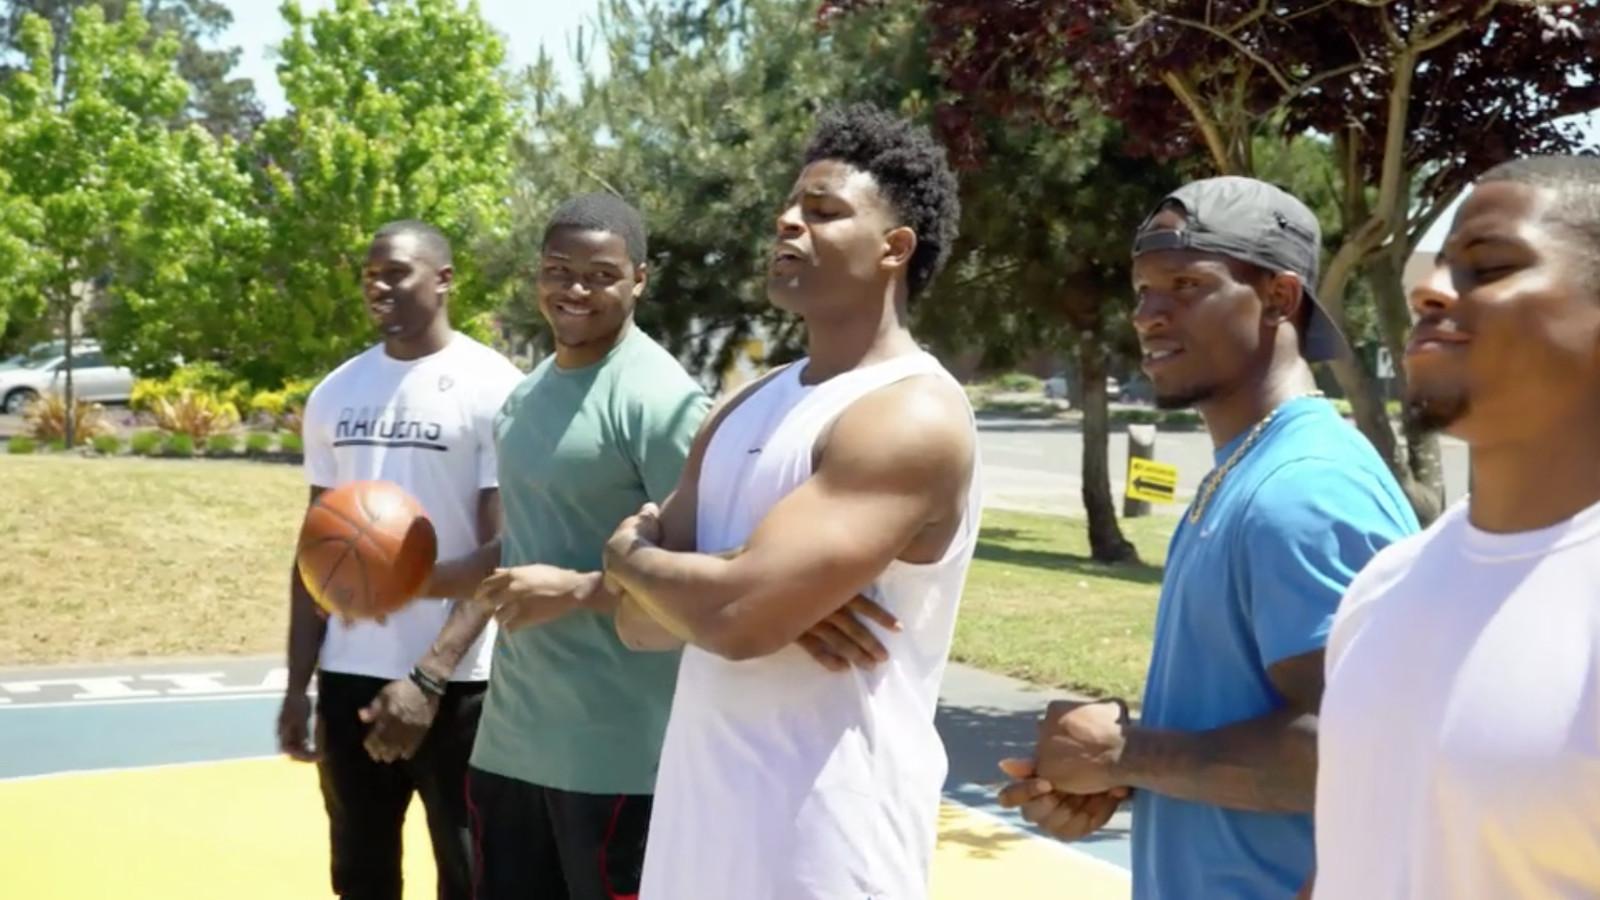 Raiders_pickup_basketball.0